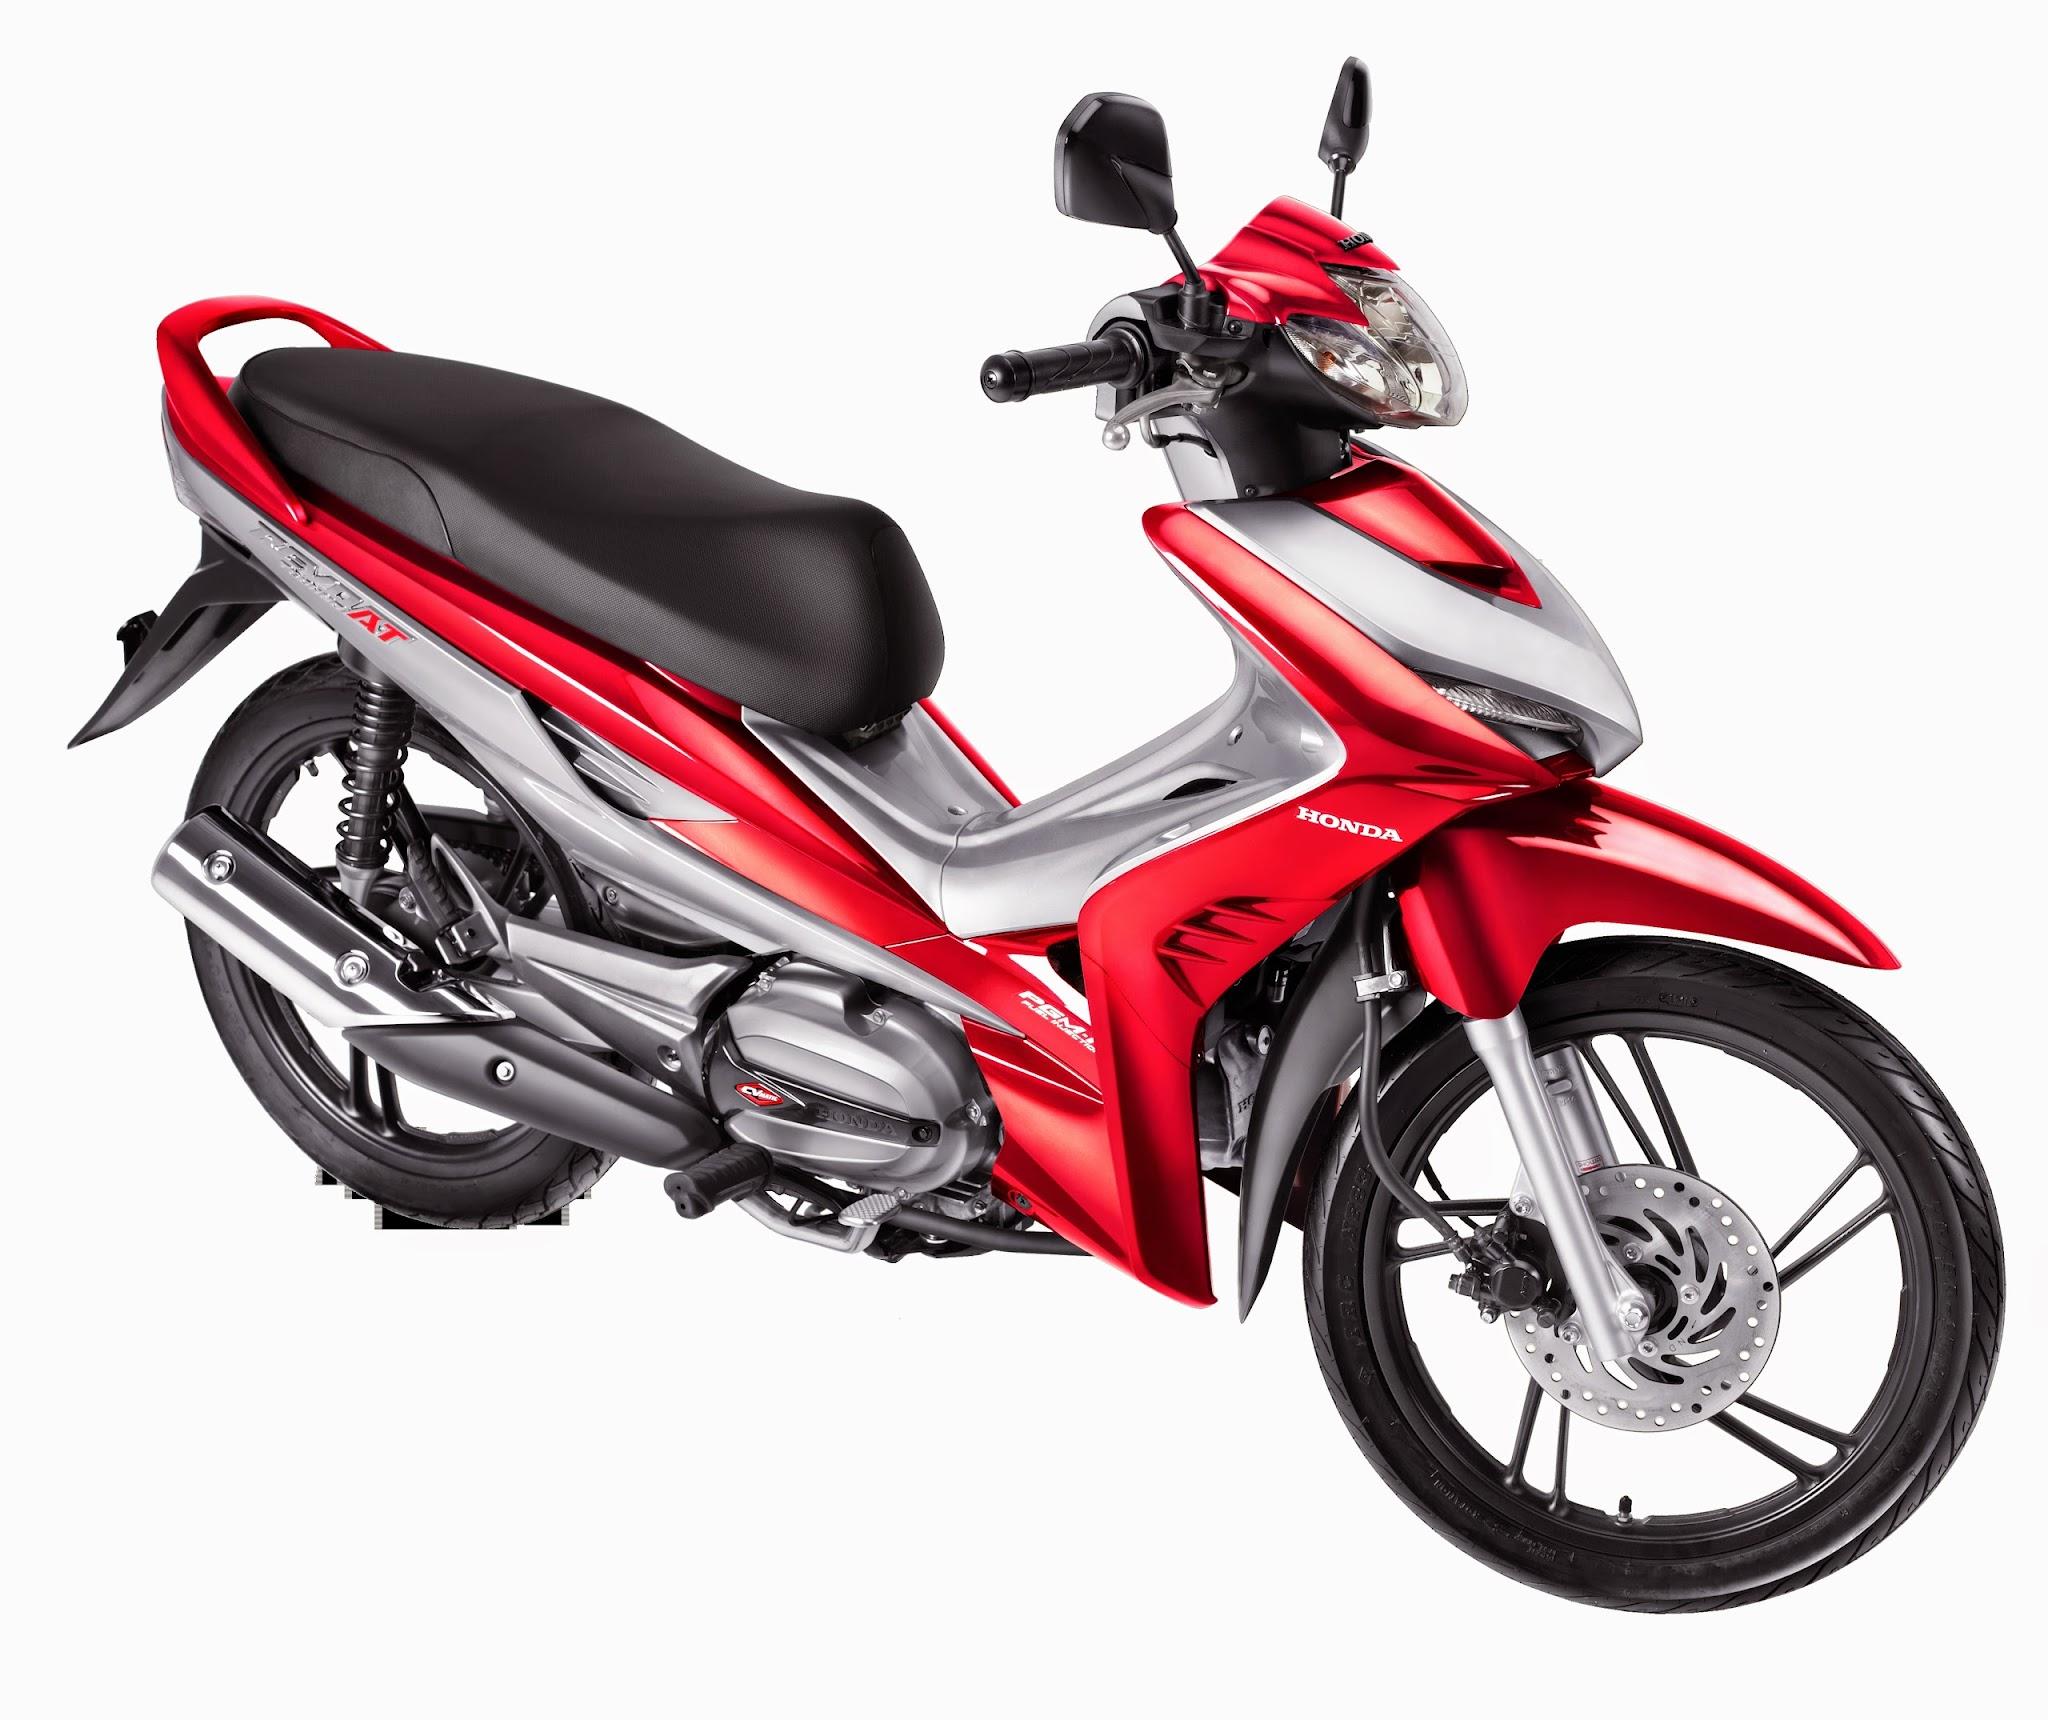 Kolesi Gambar Harga Modifikasi Motor Honda Revo Terbaru Gambar